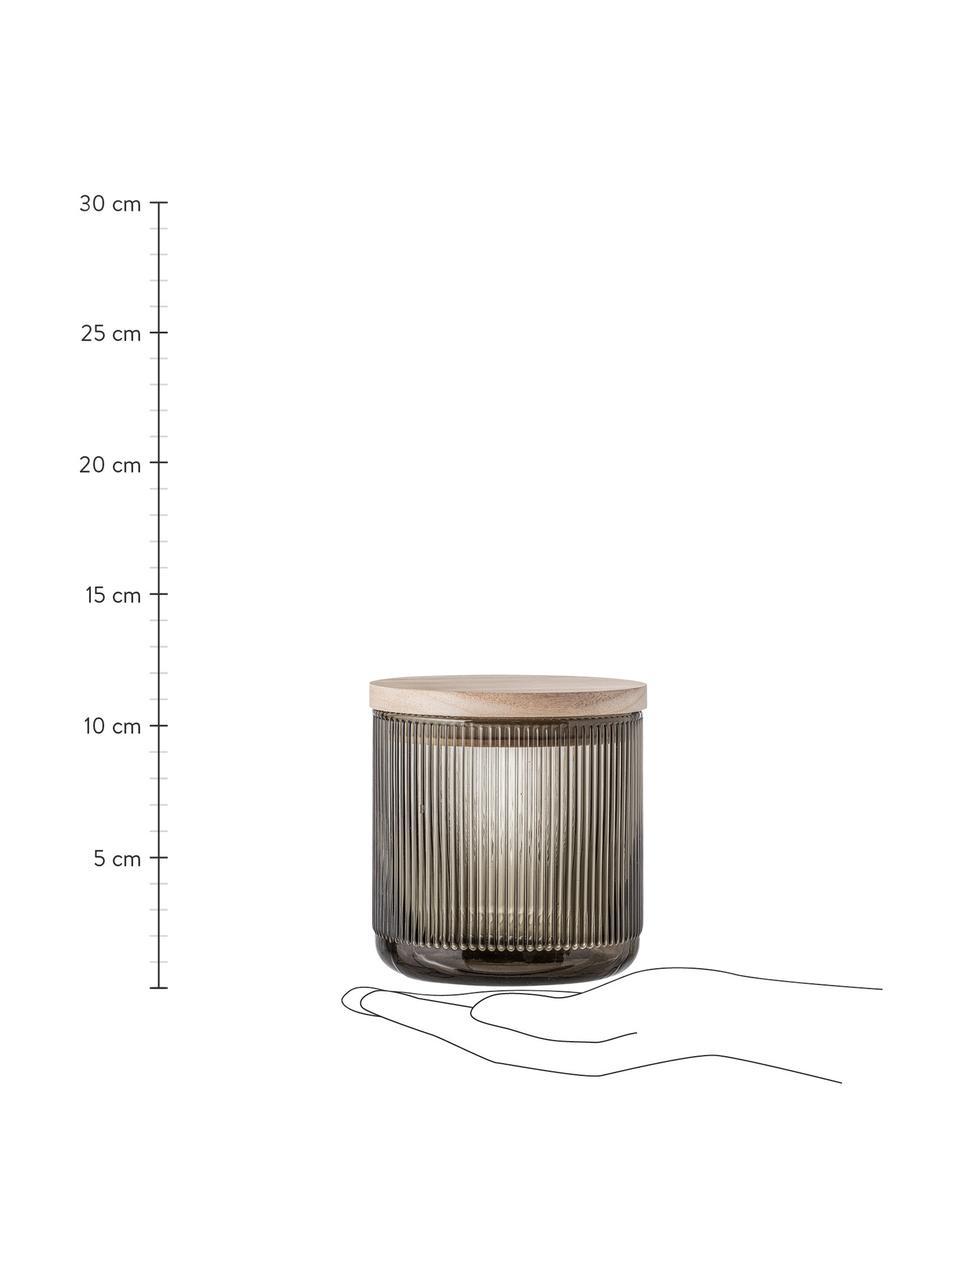 Aufbewahrungsglas Gianna mit Rillenstruktur, Ø 12 x H 12 cm, Deckel: Holz, Silikon, Grau, Holz, Ø 12 x H 12 cm